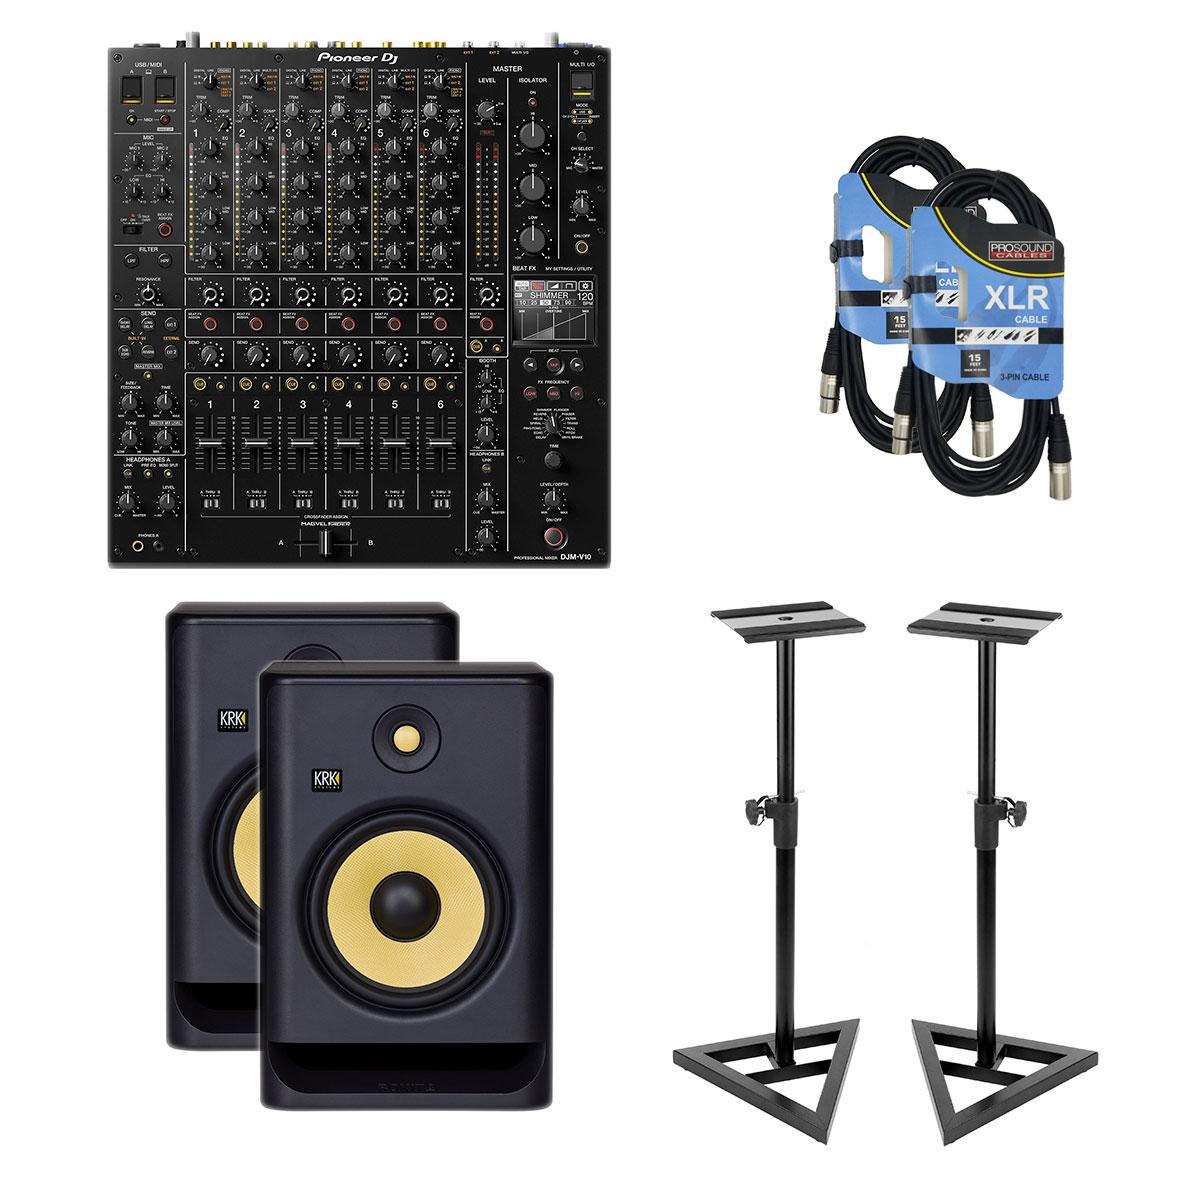 1-Pioneer-DJ-DJM-V10-6-Channel-KRK-RP8G4-Pair-Monitor-Stands-XLR-15FT-Cables-3518-2